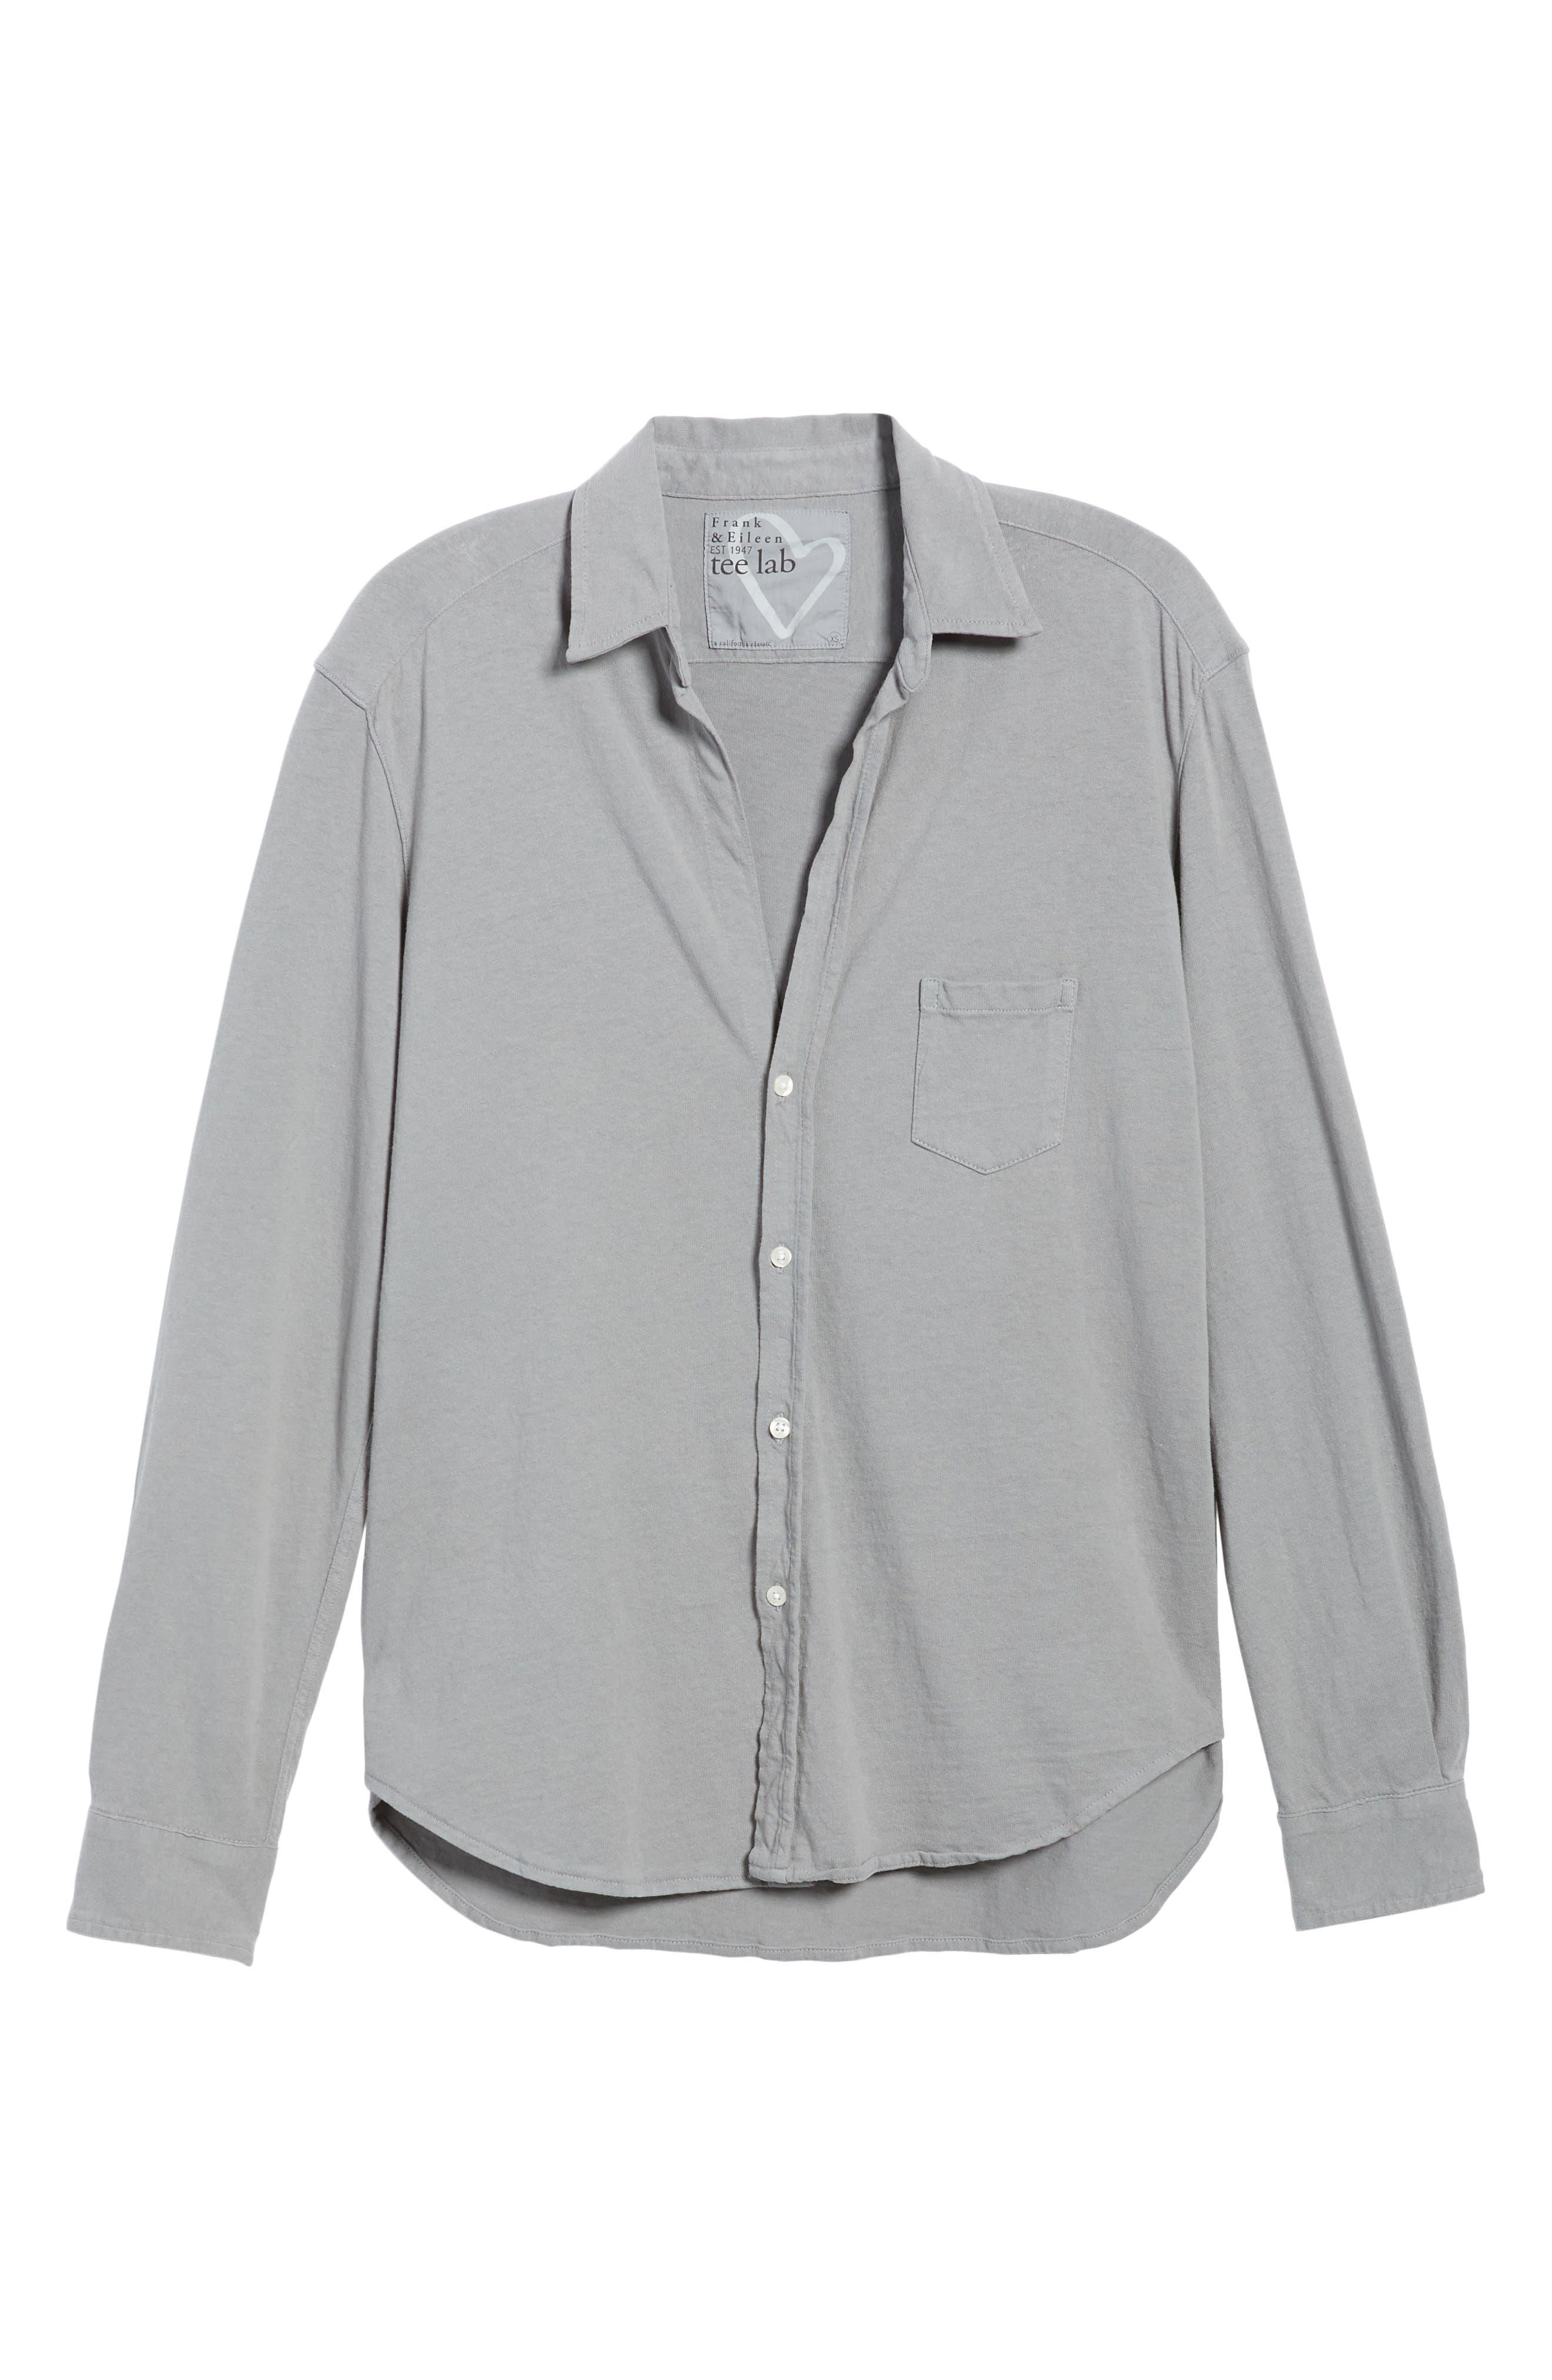 Tee Lab Knit Button Down Shirt,                             Alternate thumbnail 6, color,                             037